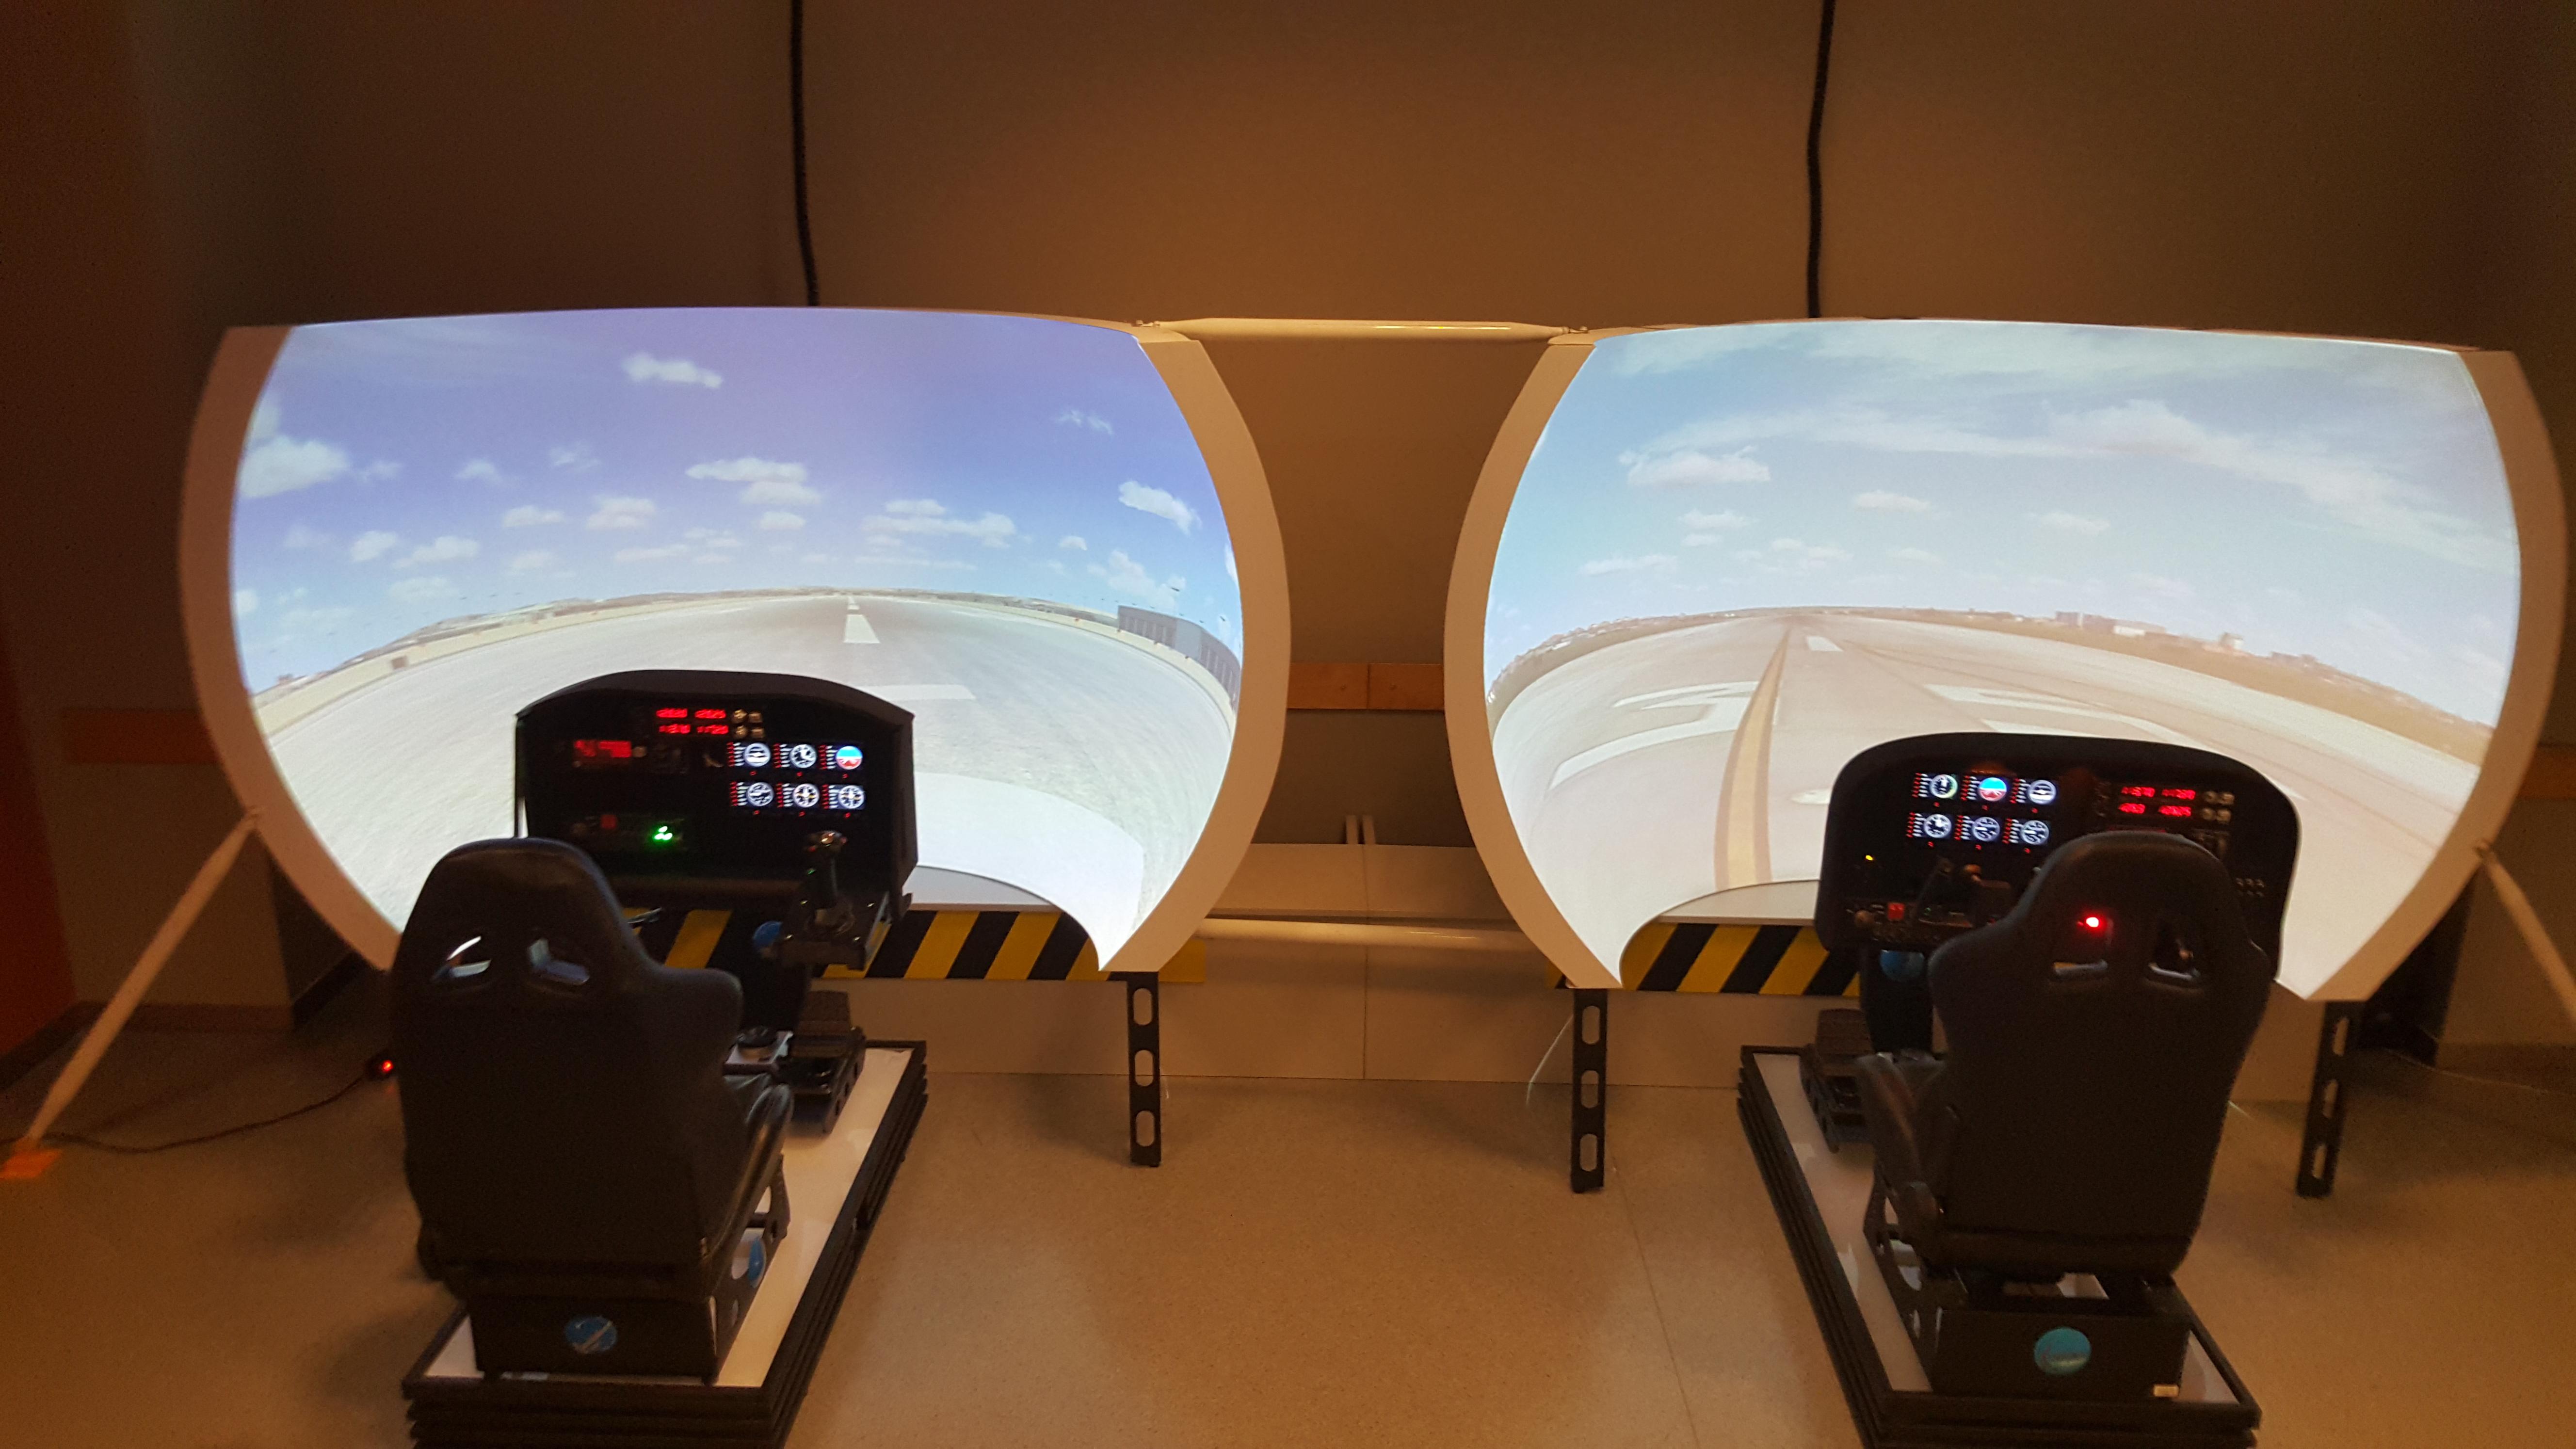 XTOP & MyTOP flight panels